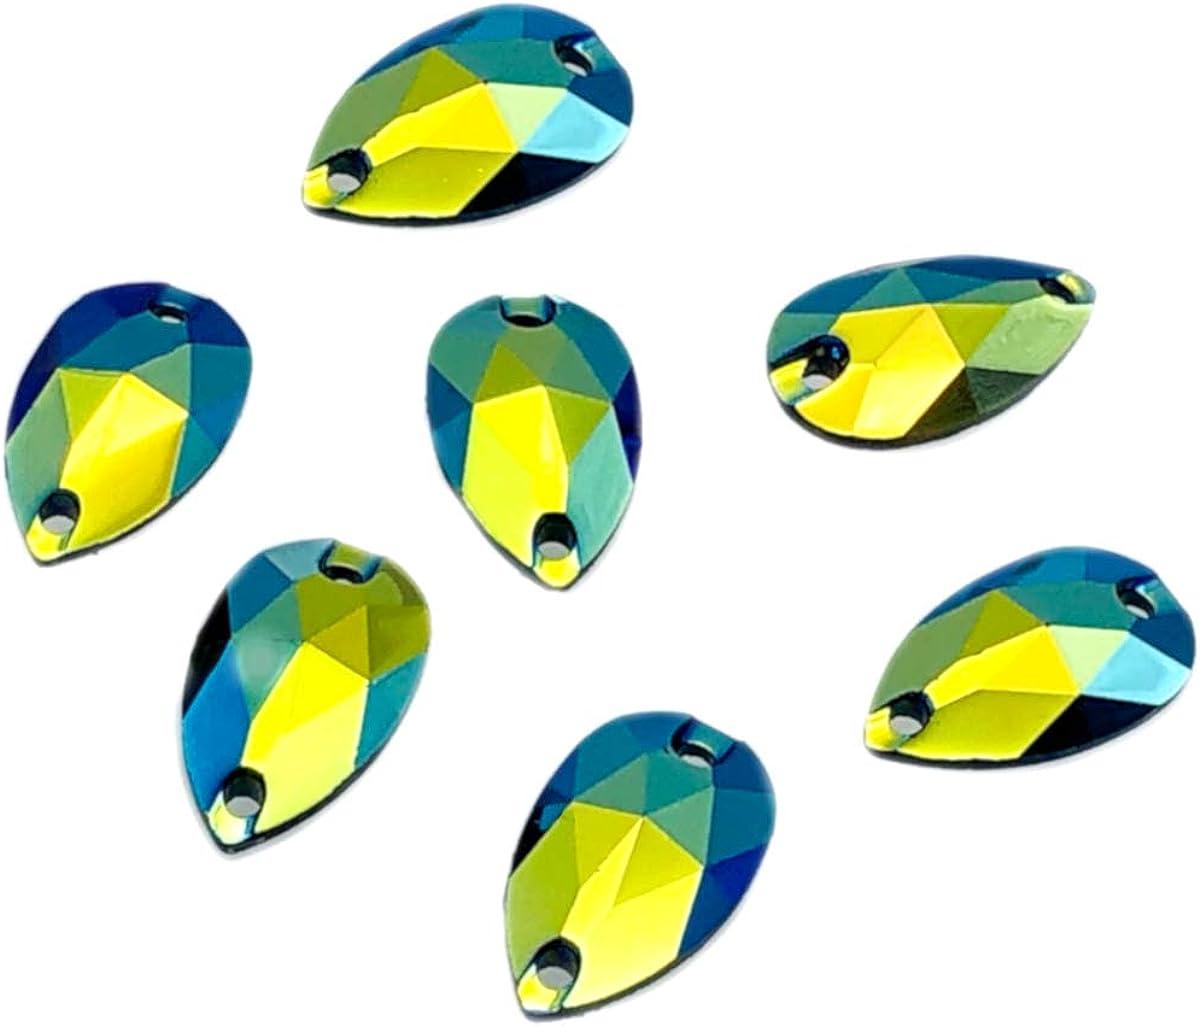 50 unidades de la marca Eimass para coser o pegar Cristales de resina con forma de l/ágrimas